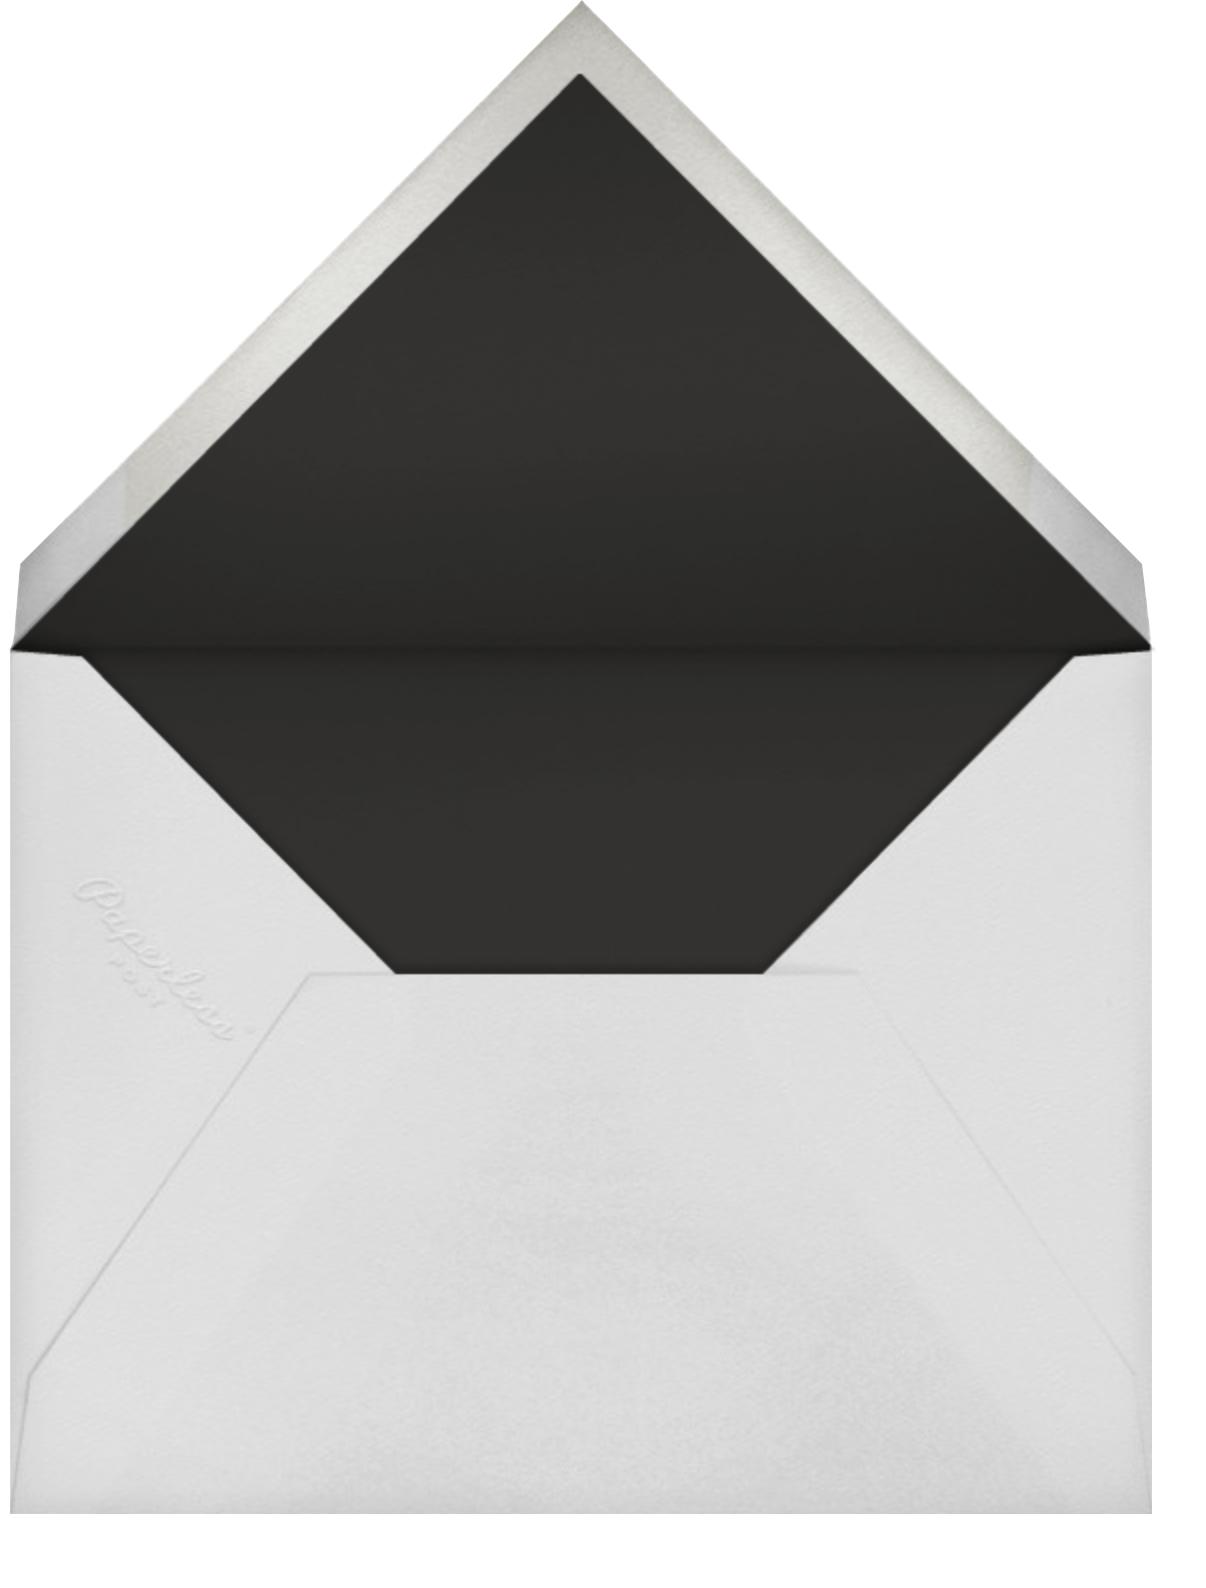 Saranac (Thank You) - Taupe - Crane & Co. - null - envelope back